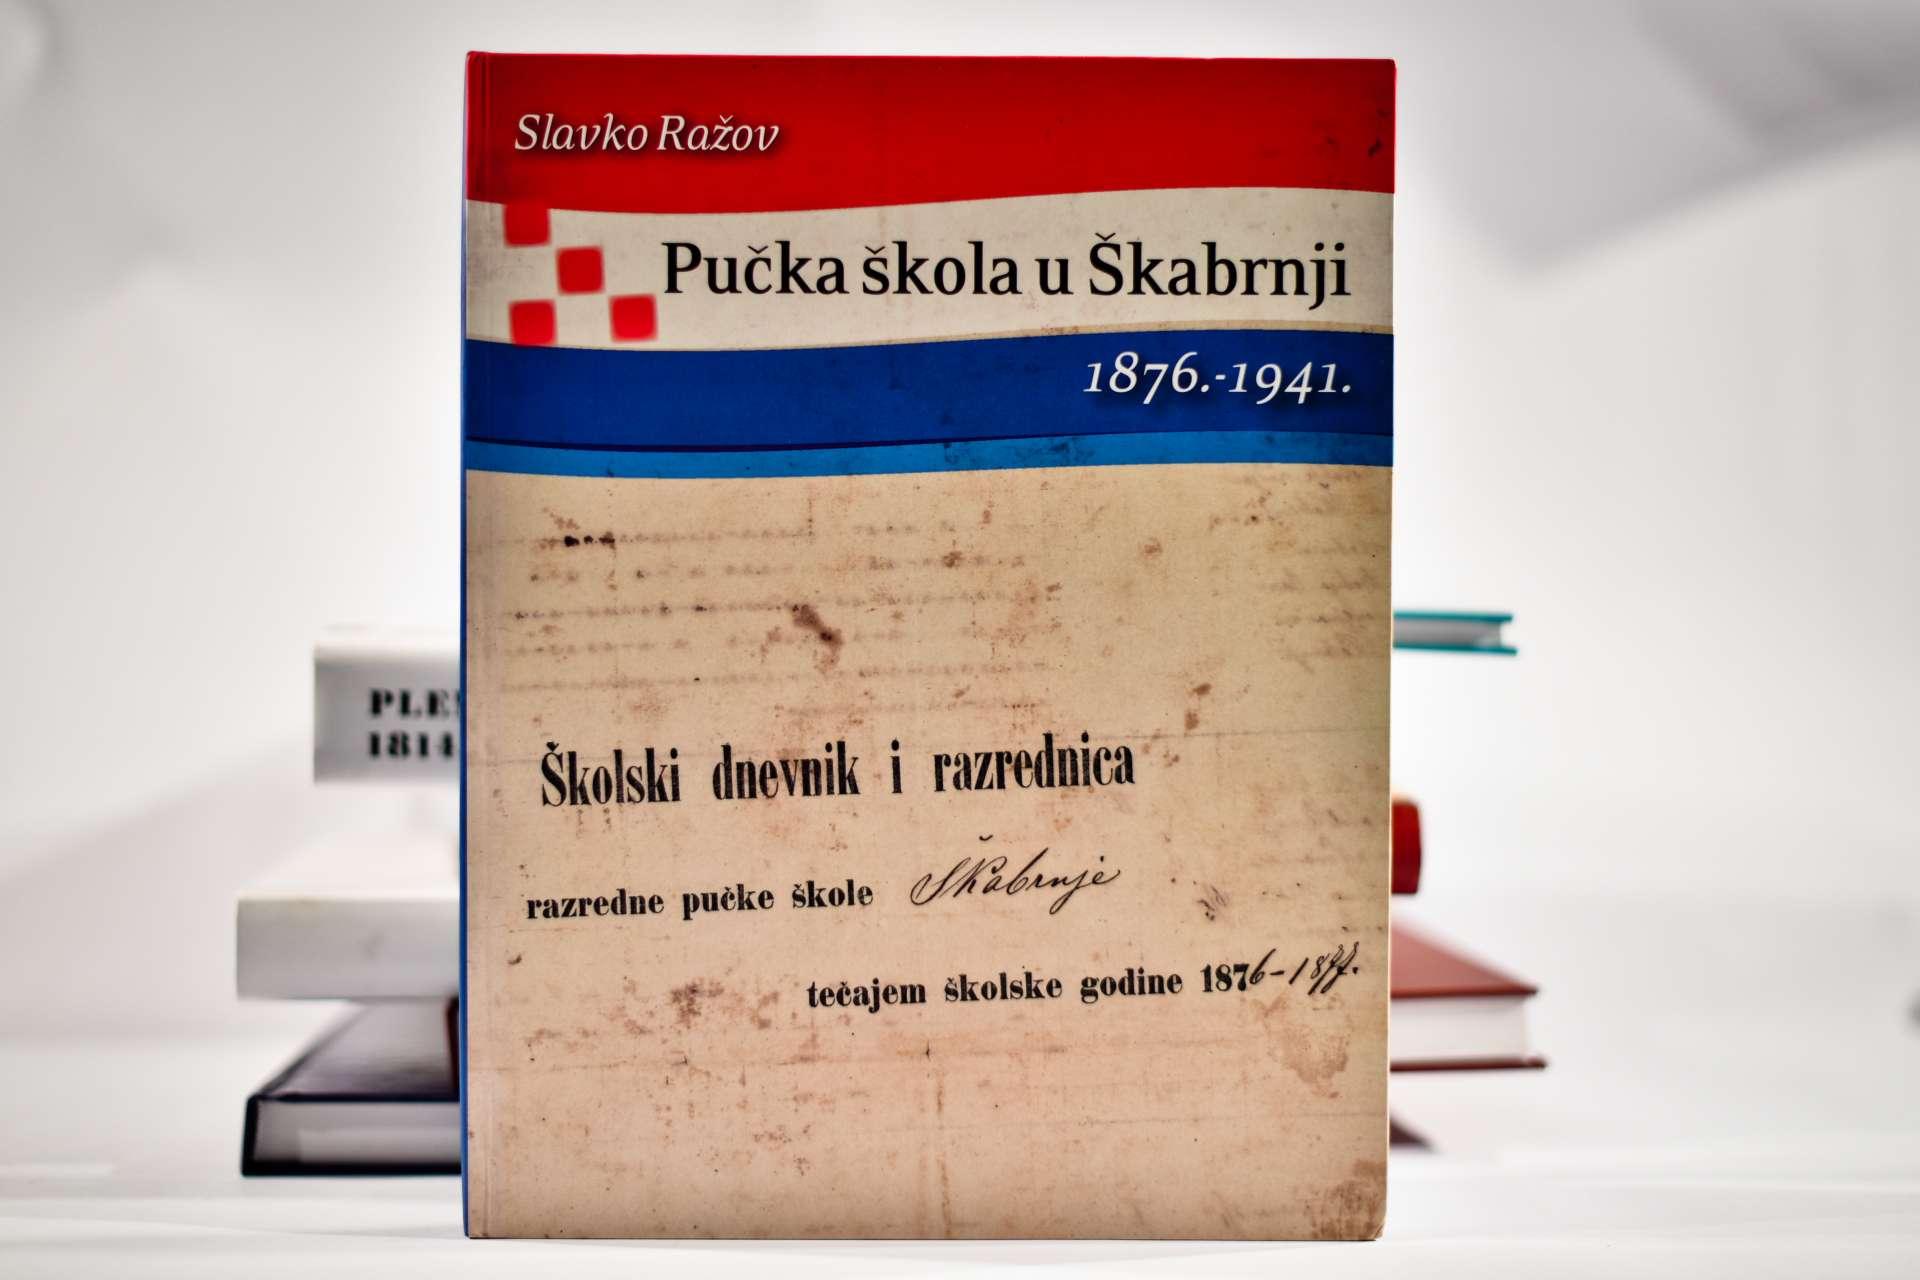 PUČKA ŠKOLA U ŠKABRNJI (1876. - 1941.)